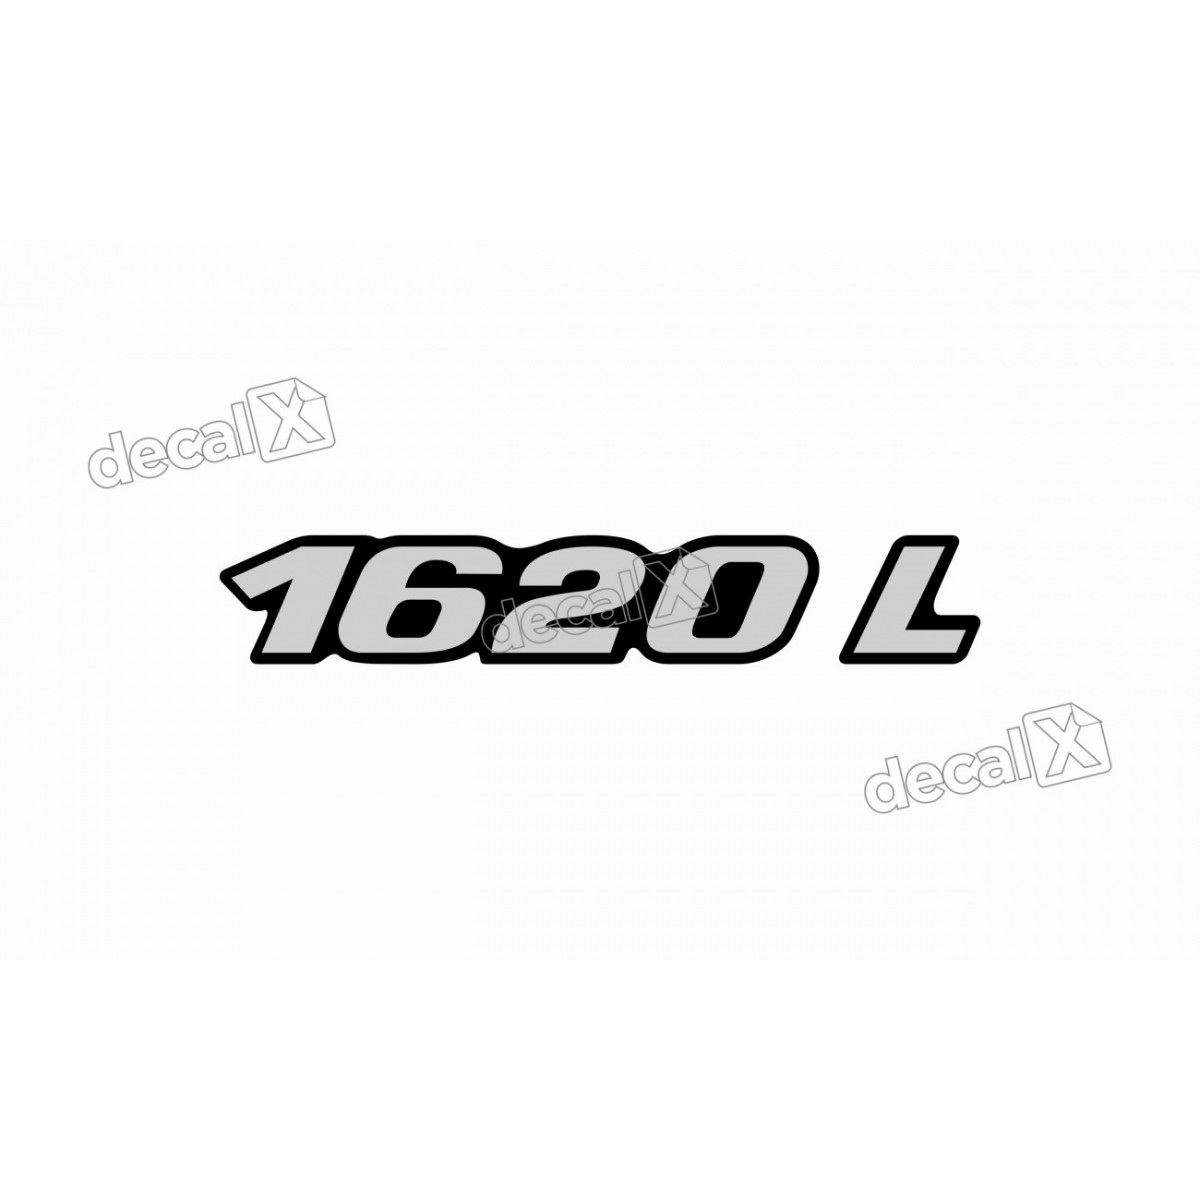 Adesivo Emblema Resinado Mercedes 1620 L Cm46 Decalx